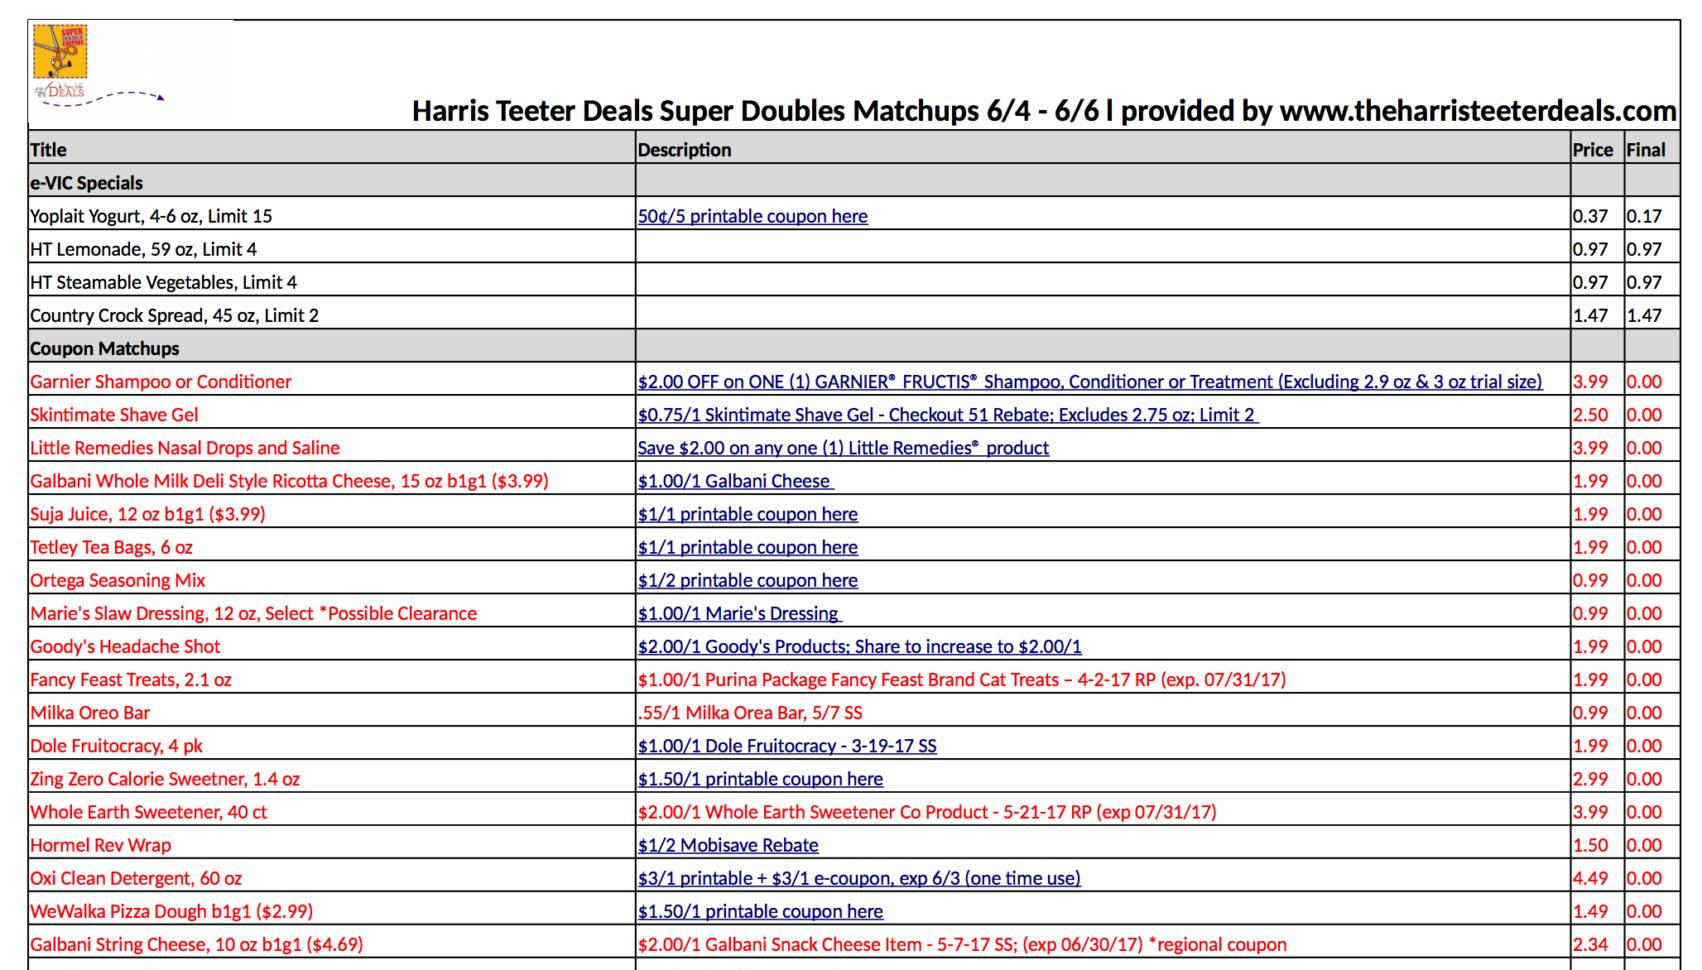 Harris Teeter Coupon Spreadsheet Pertaining To Harris Teeter Deals Super Doubles Spreadsheet 6/4  6/6  The Harris